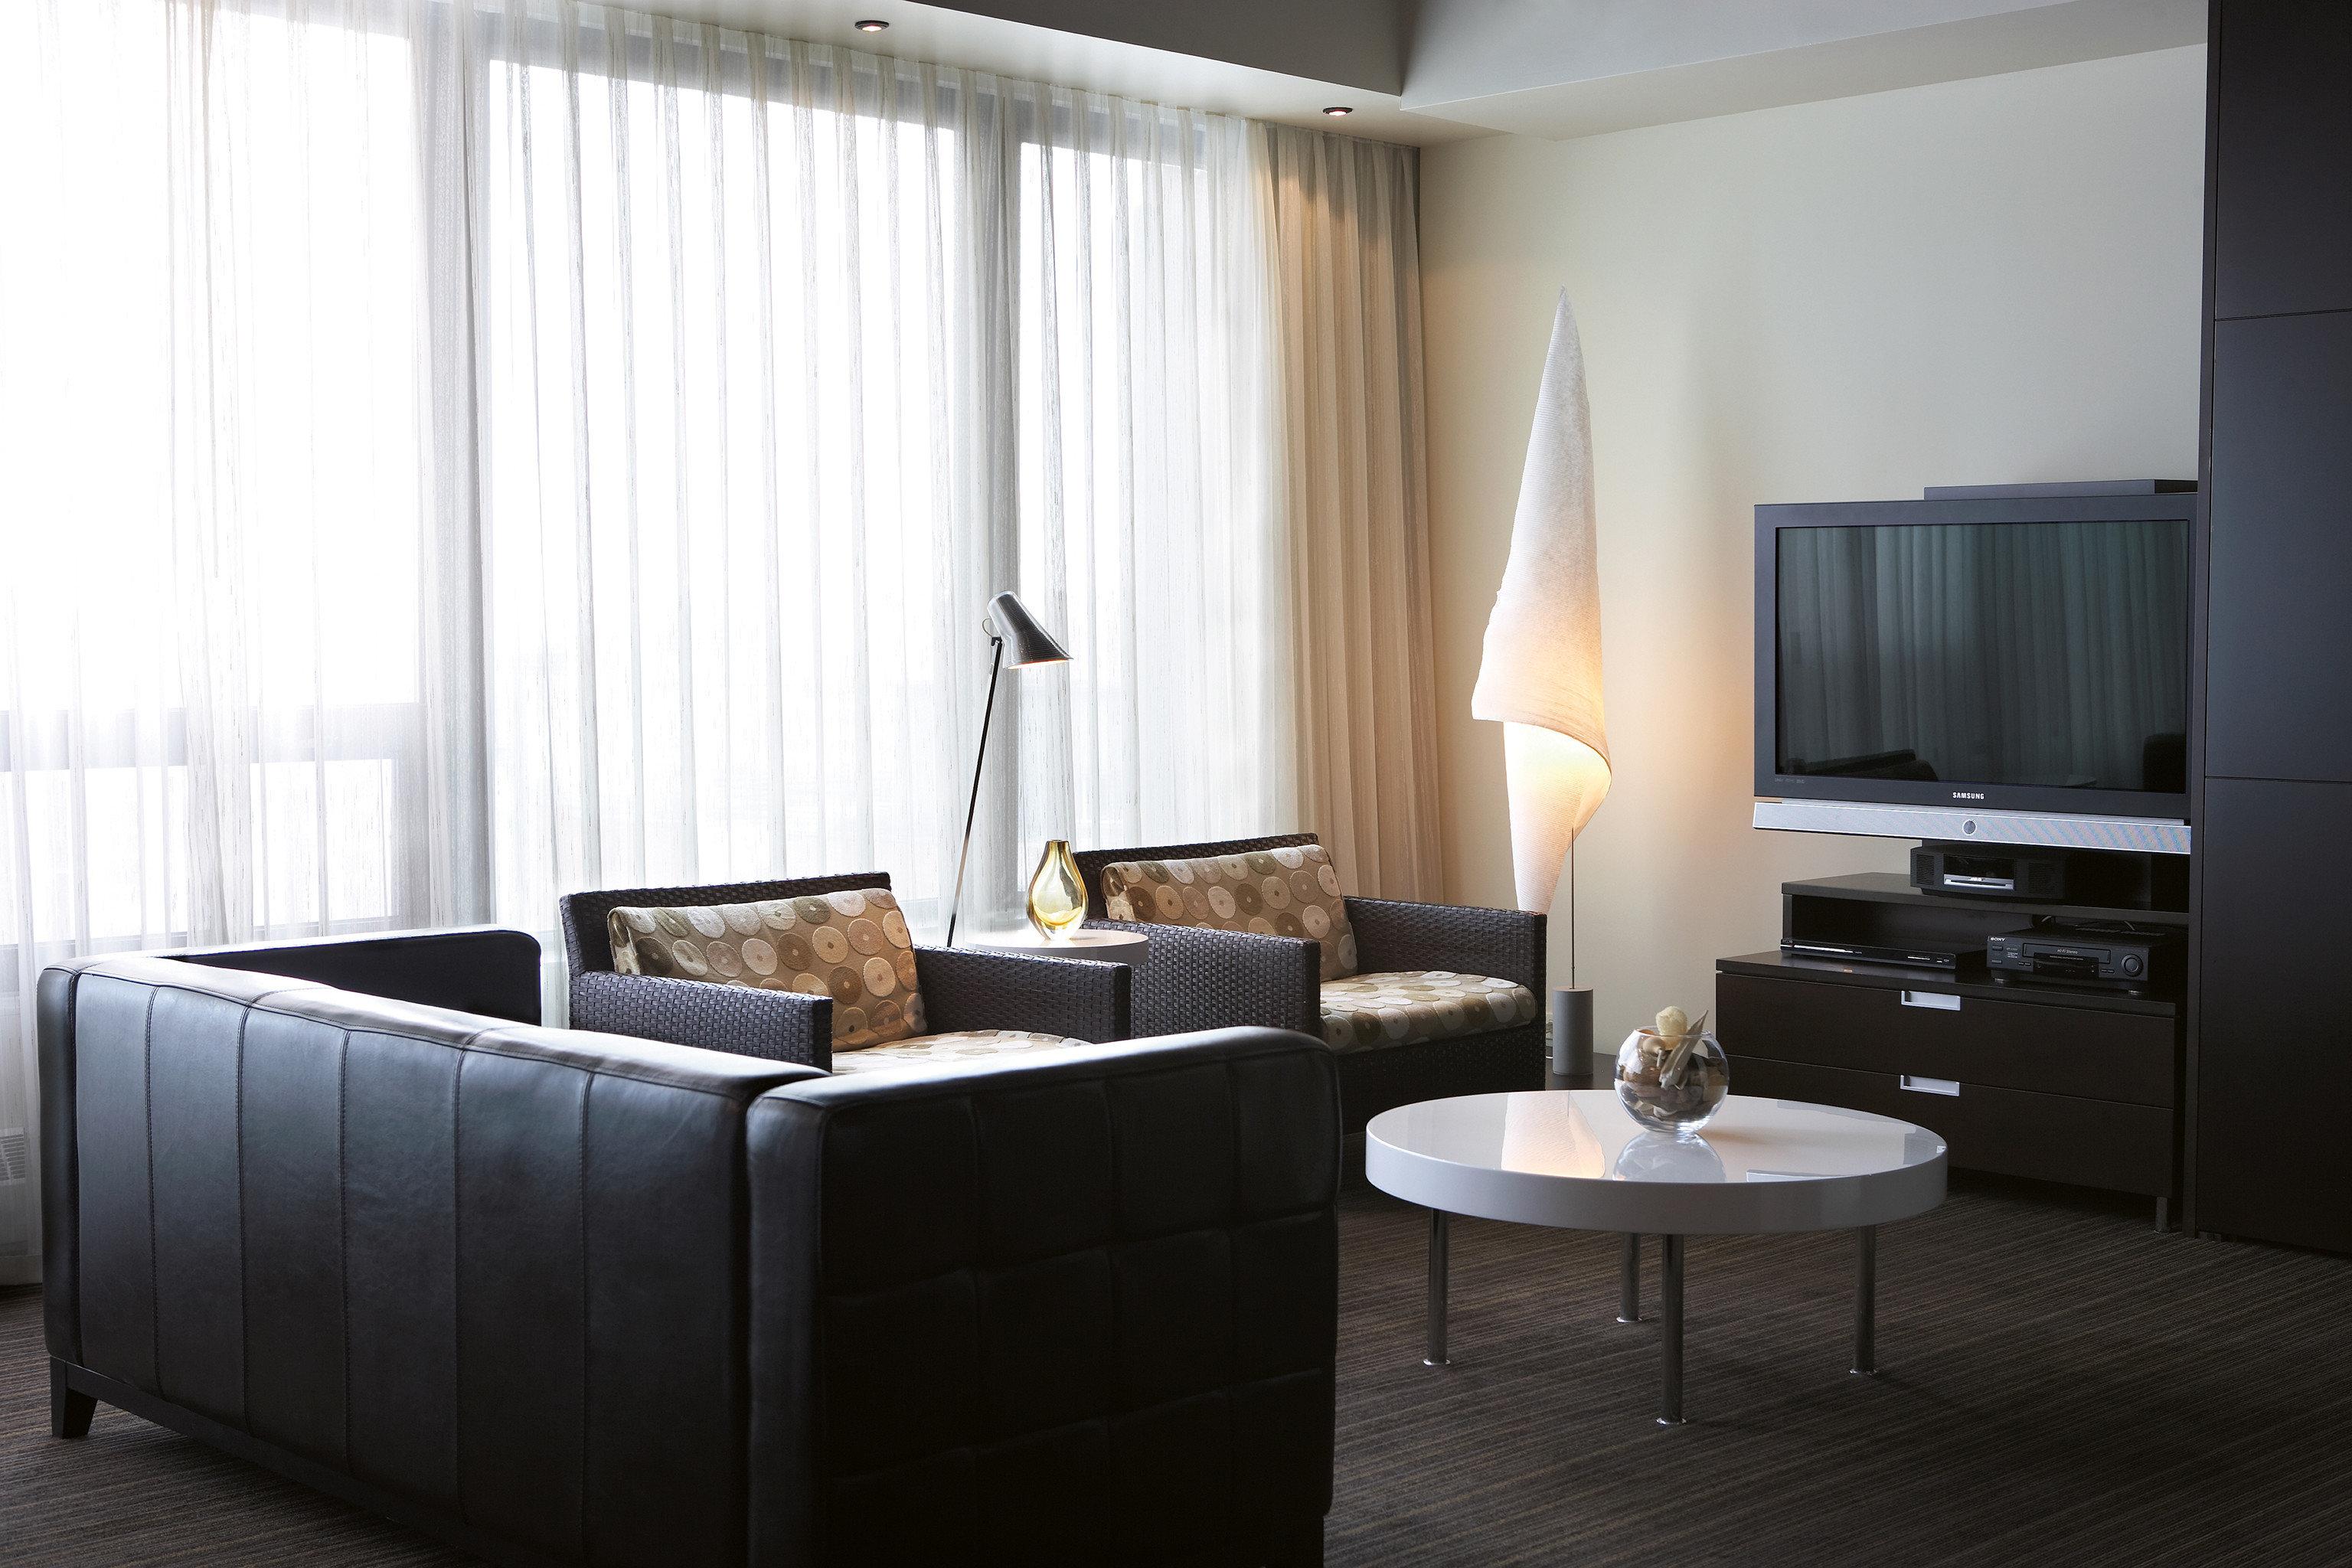 Boutique Entertainment Modern sofa property living room lighting Suite Bedroom